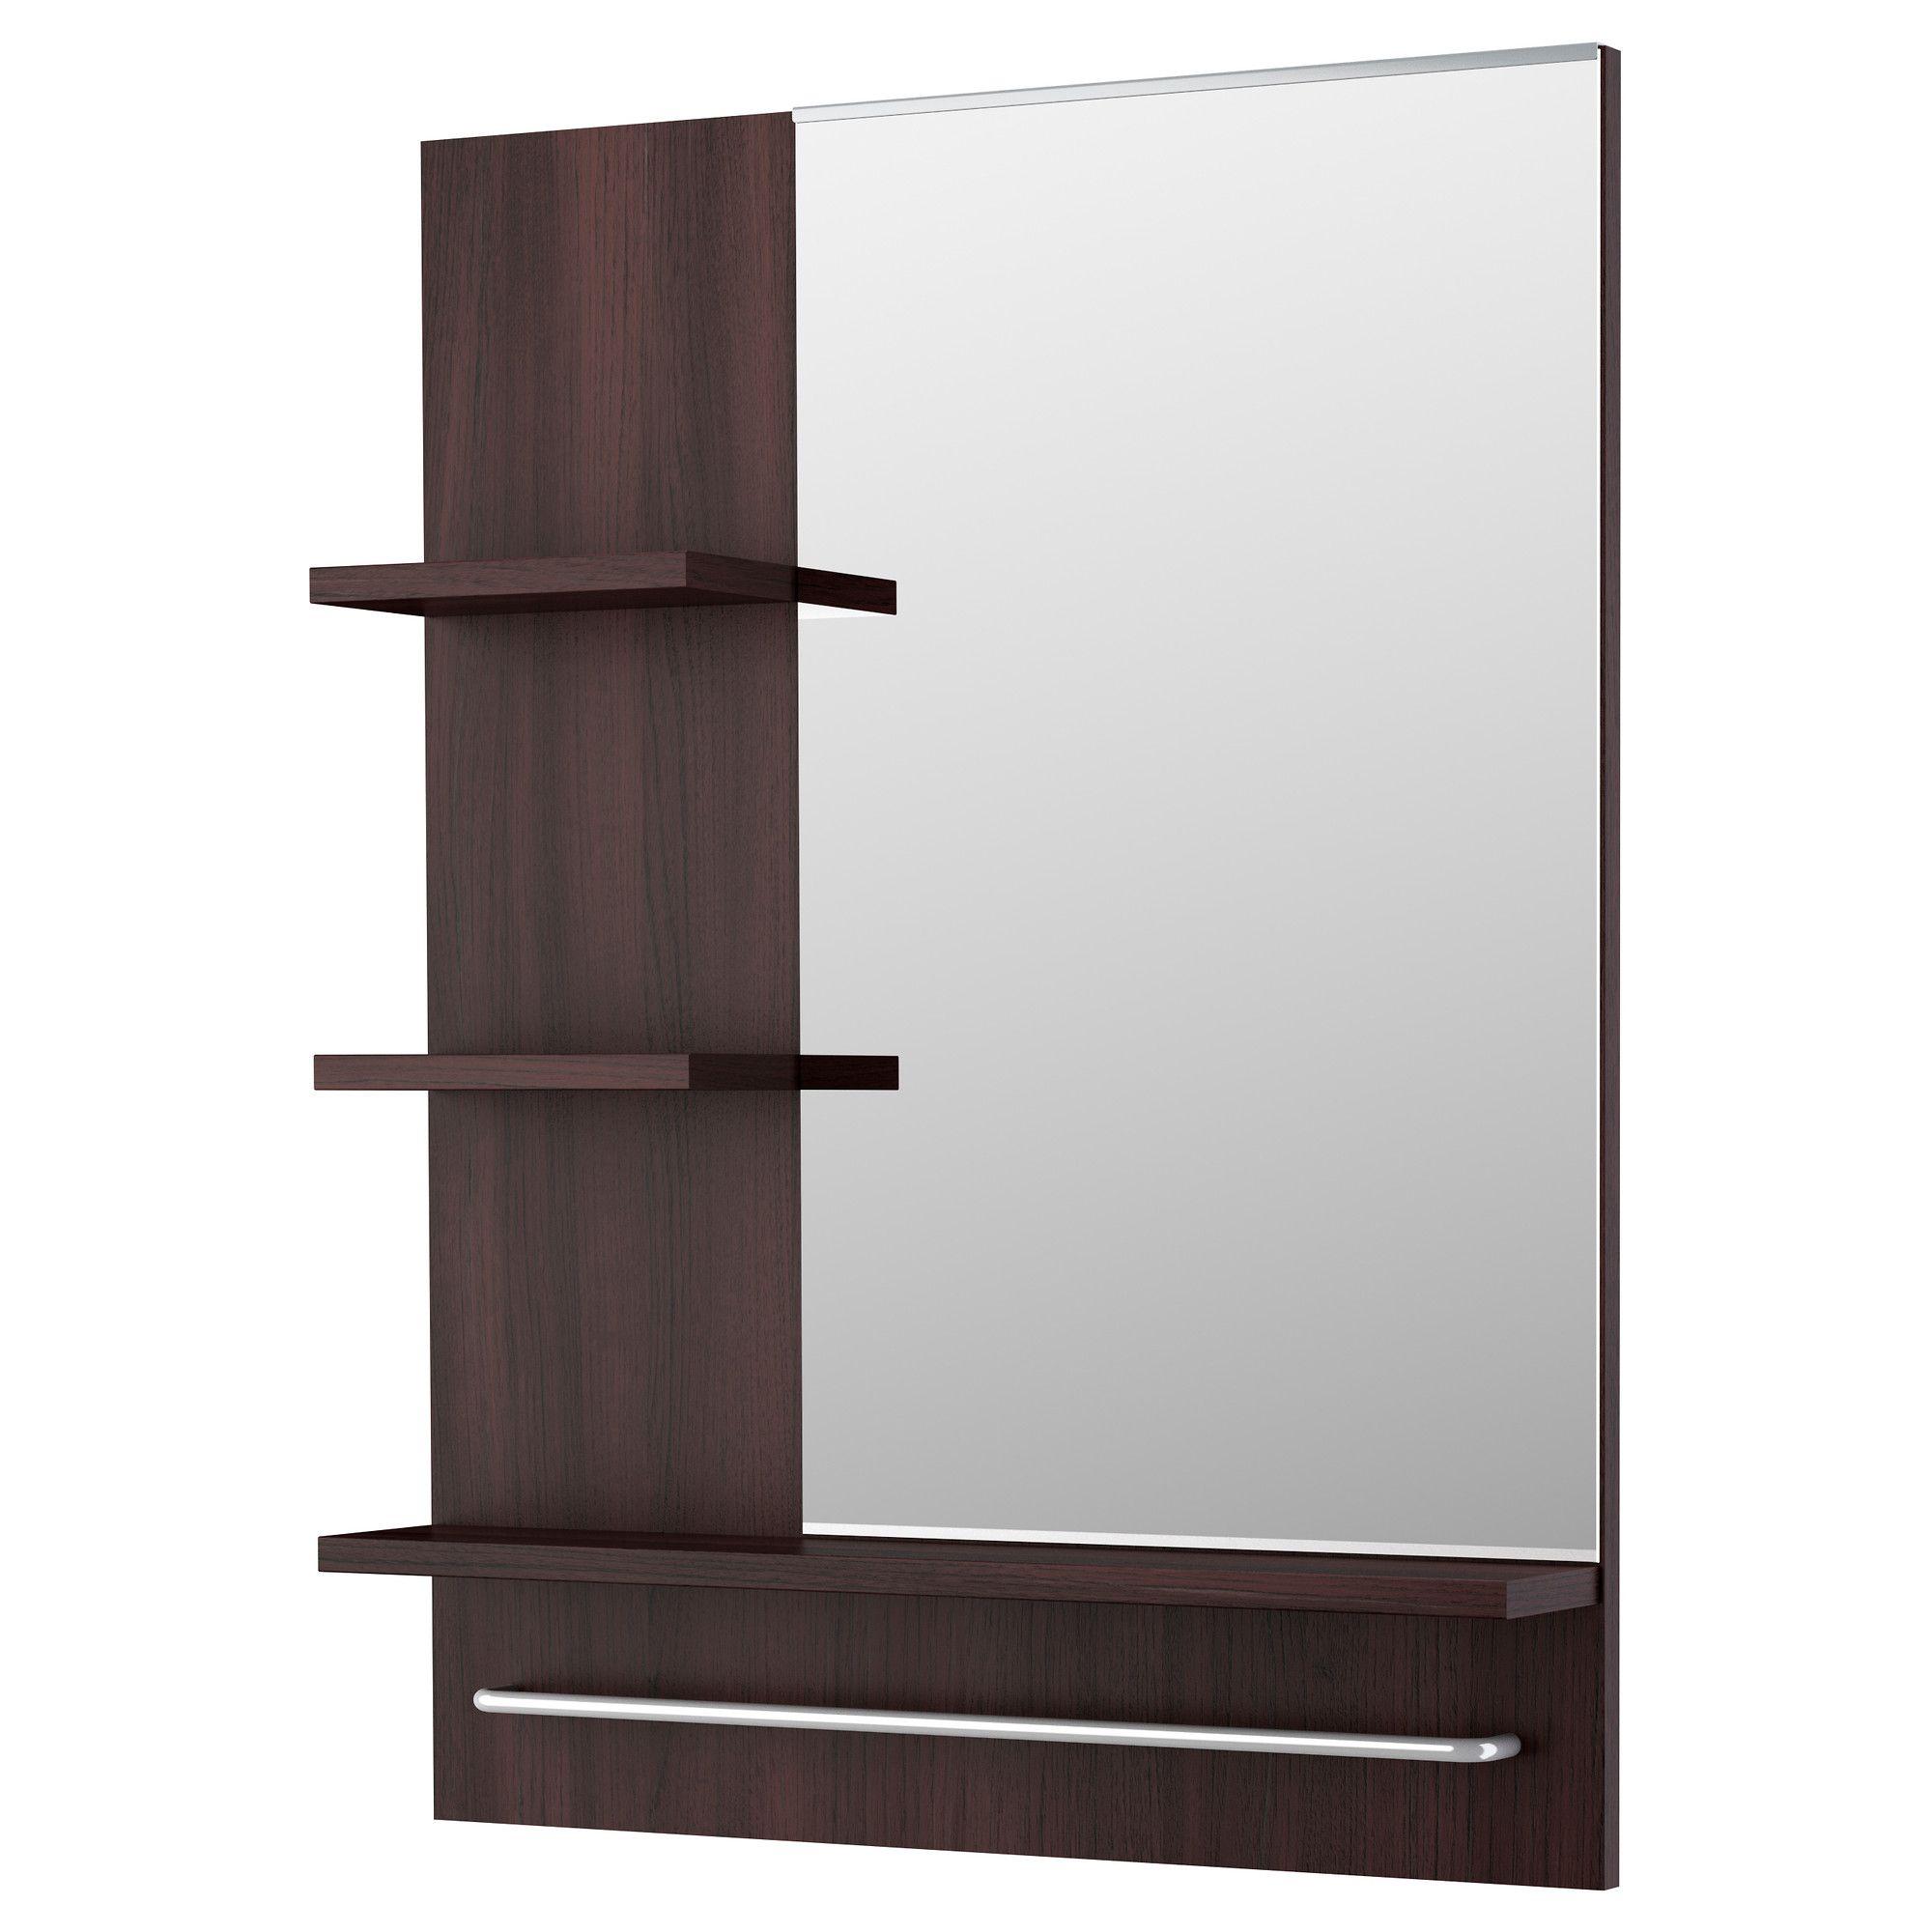 Mirror door, ikea and mirror cabinets on pinterest